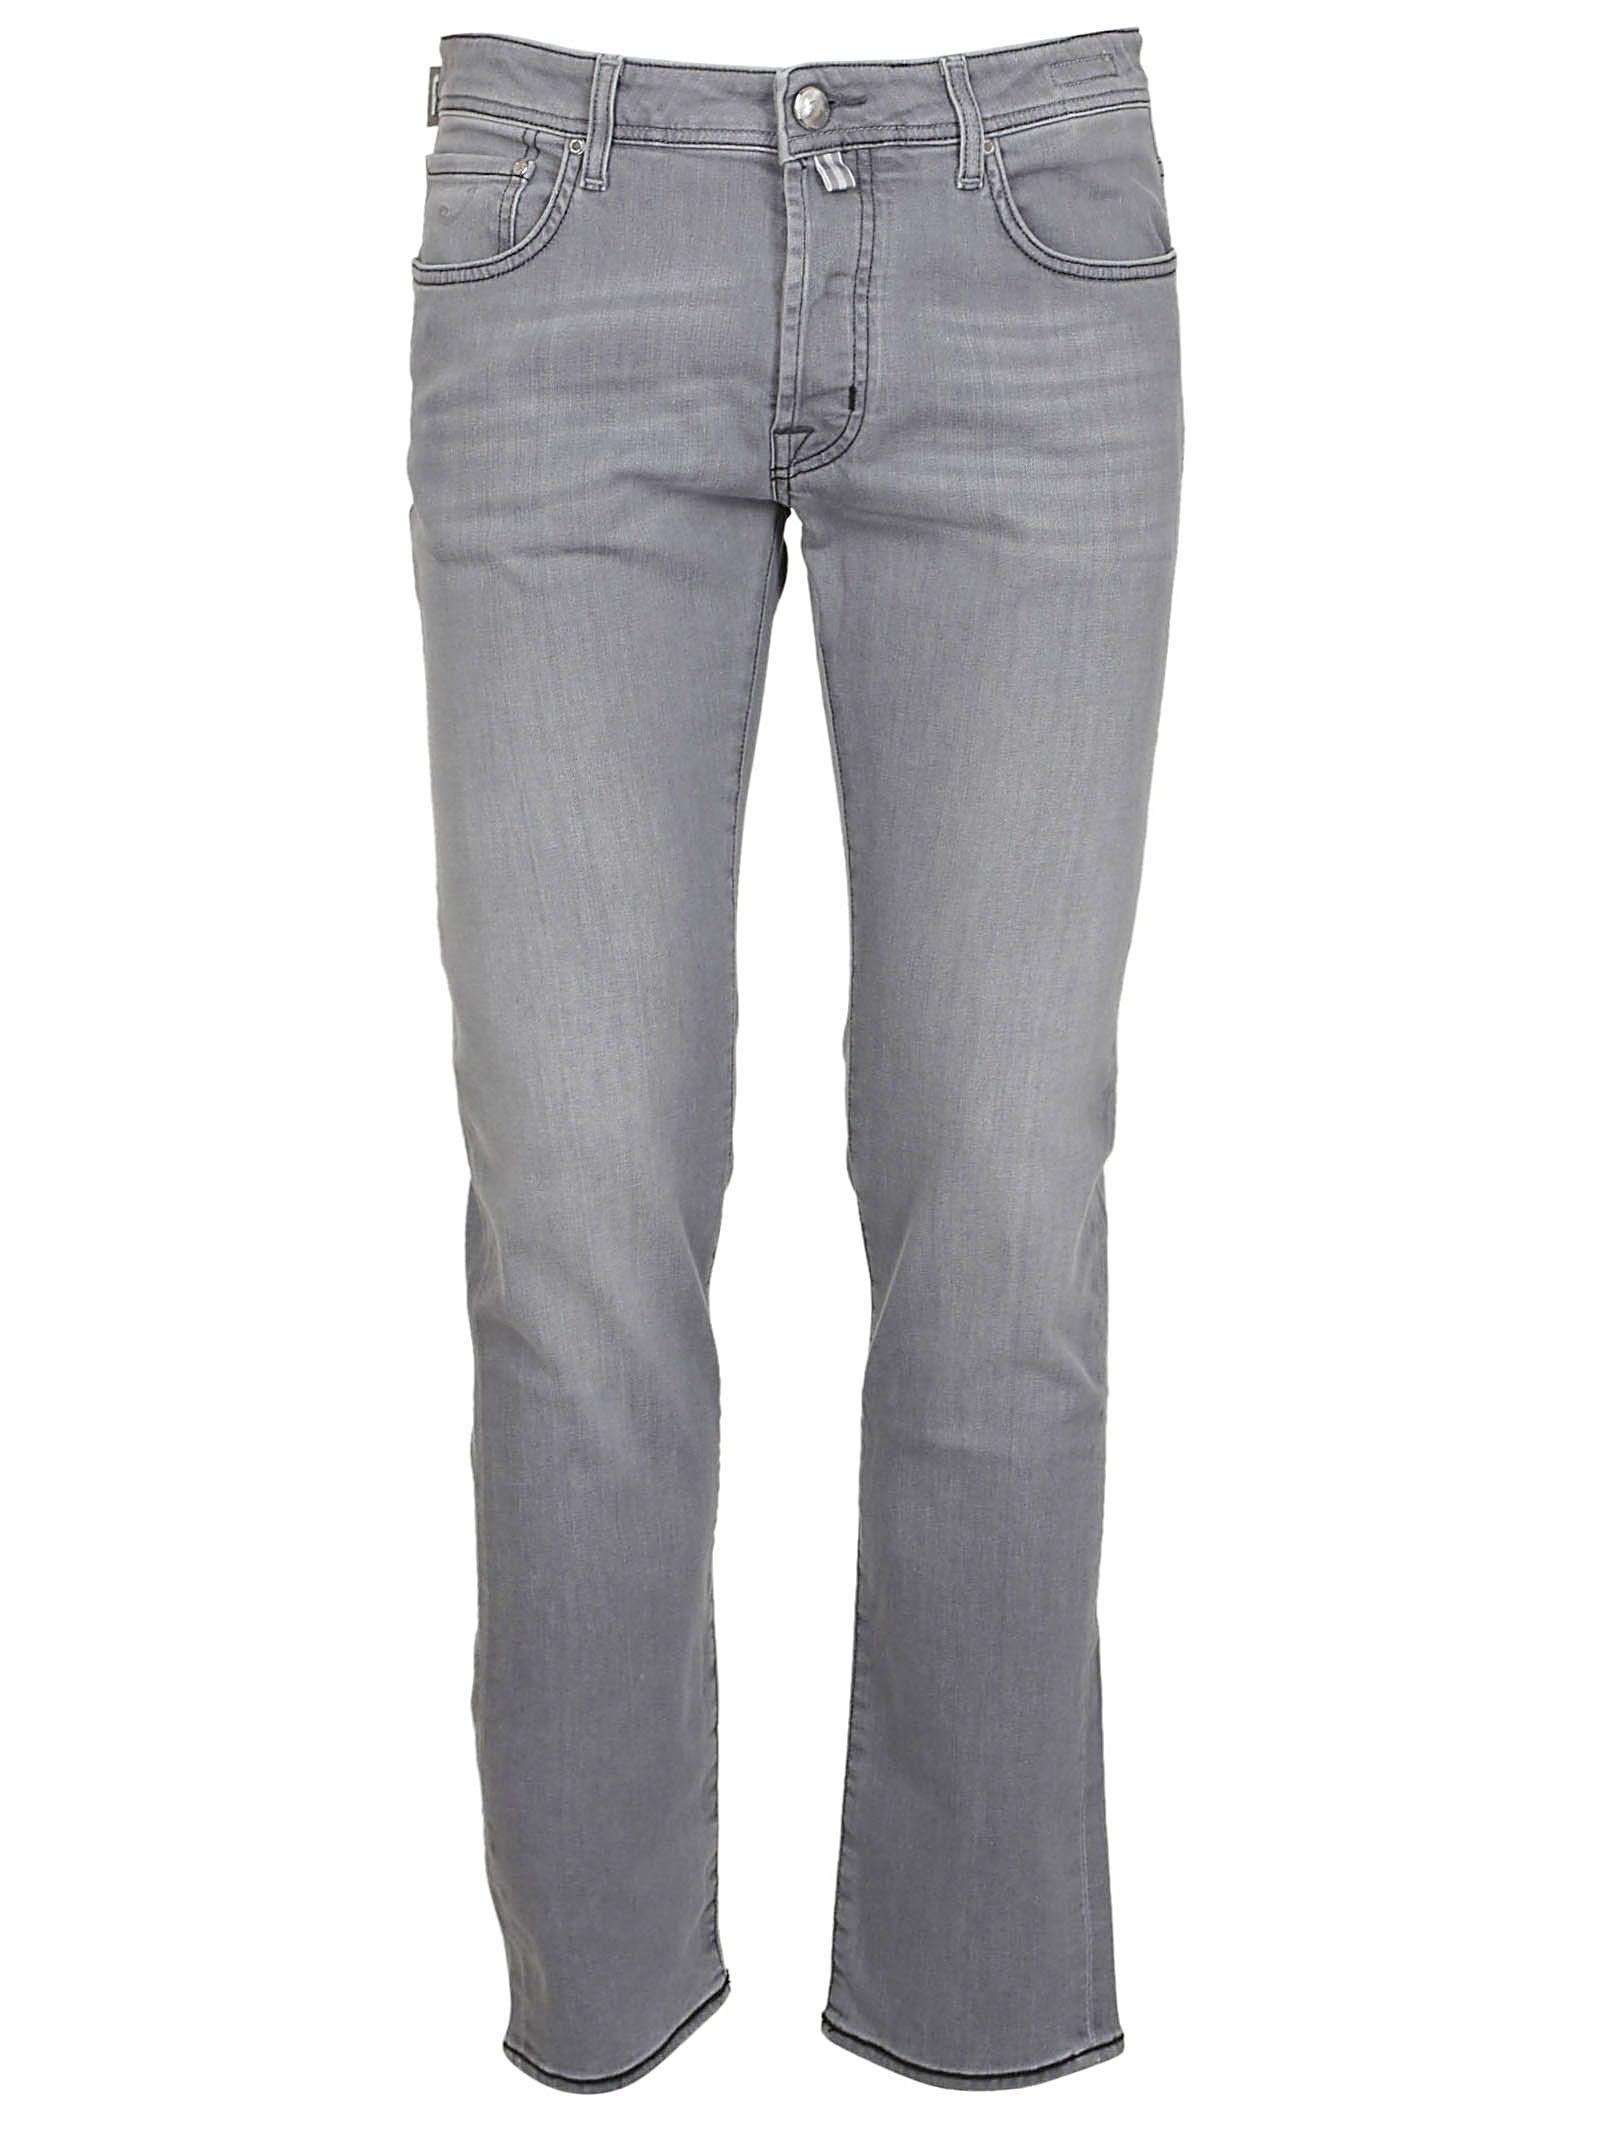 4612aca1f9edfd Jacob Cohen Jacob Cohen Slim Fit Jeans - Grigio medio - 10845535 ...